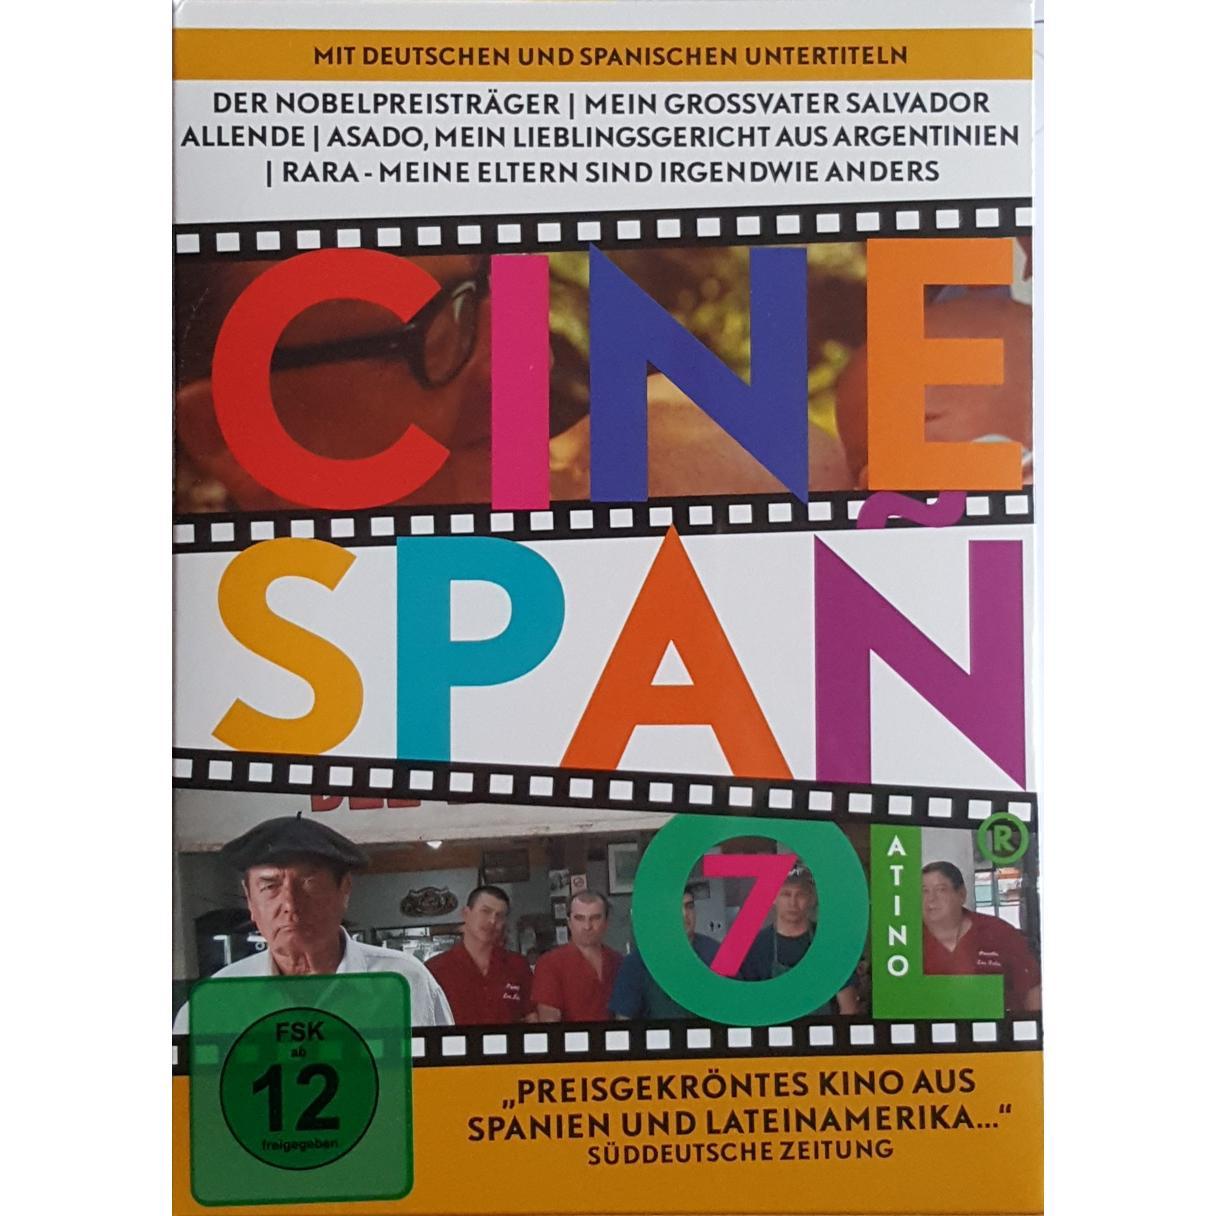 Cinespañol 7